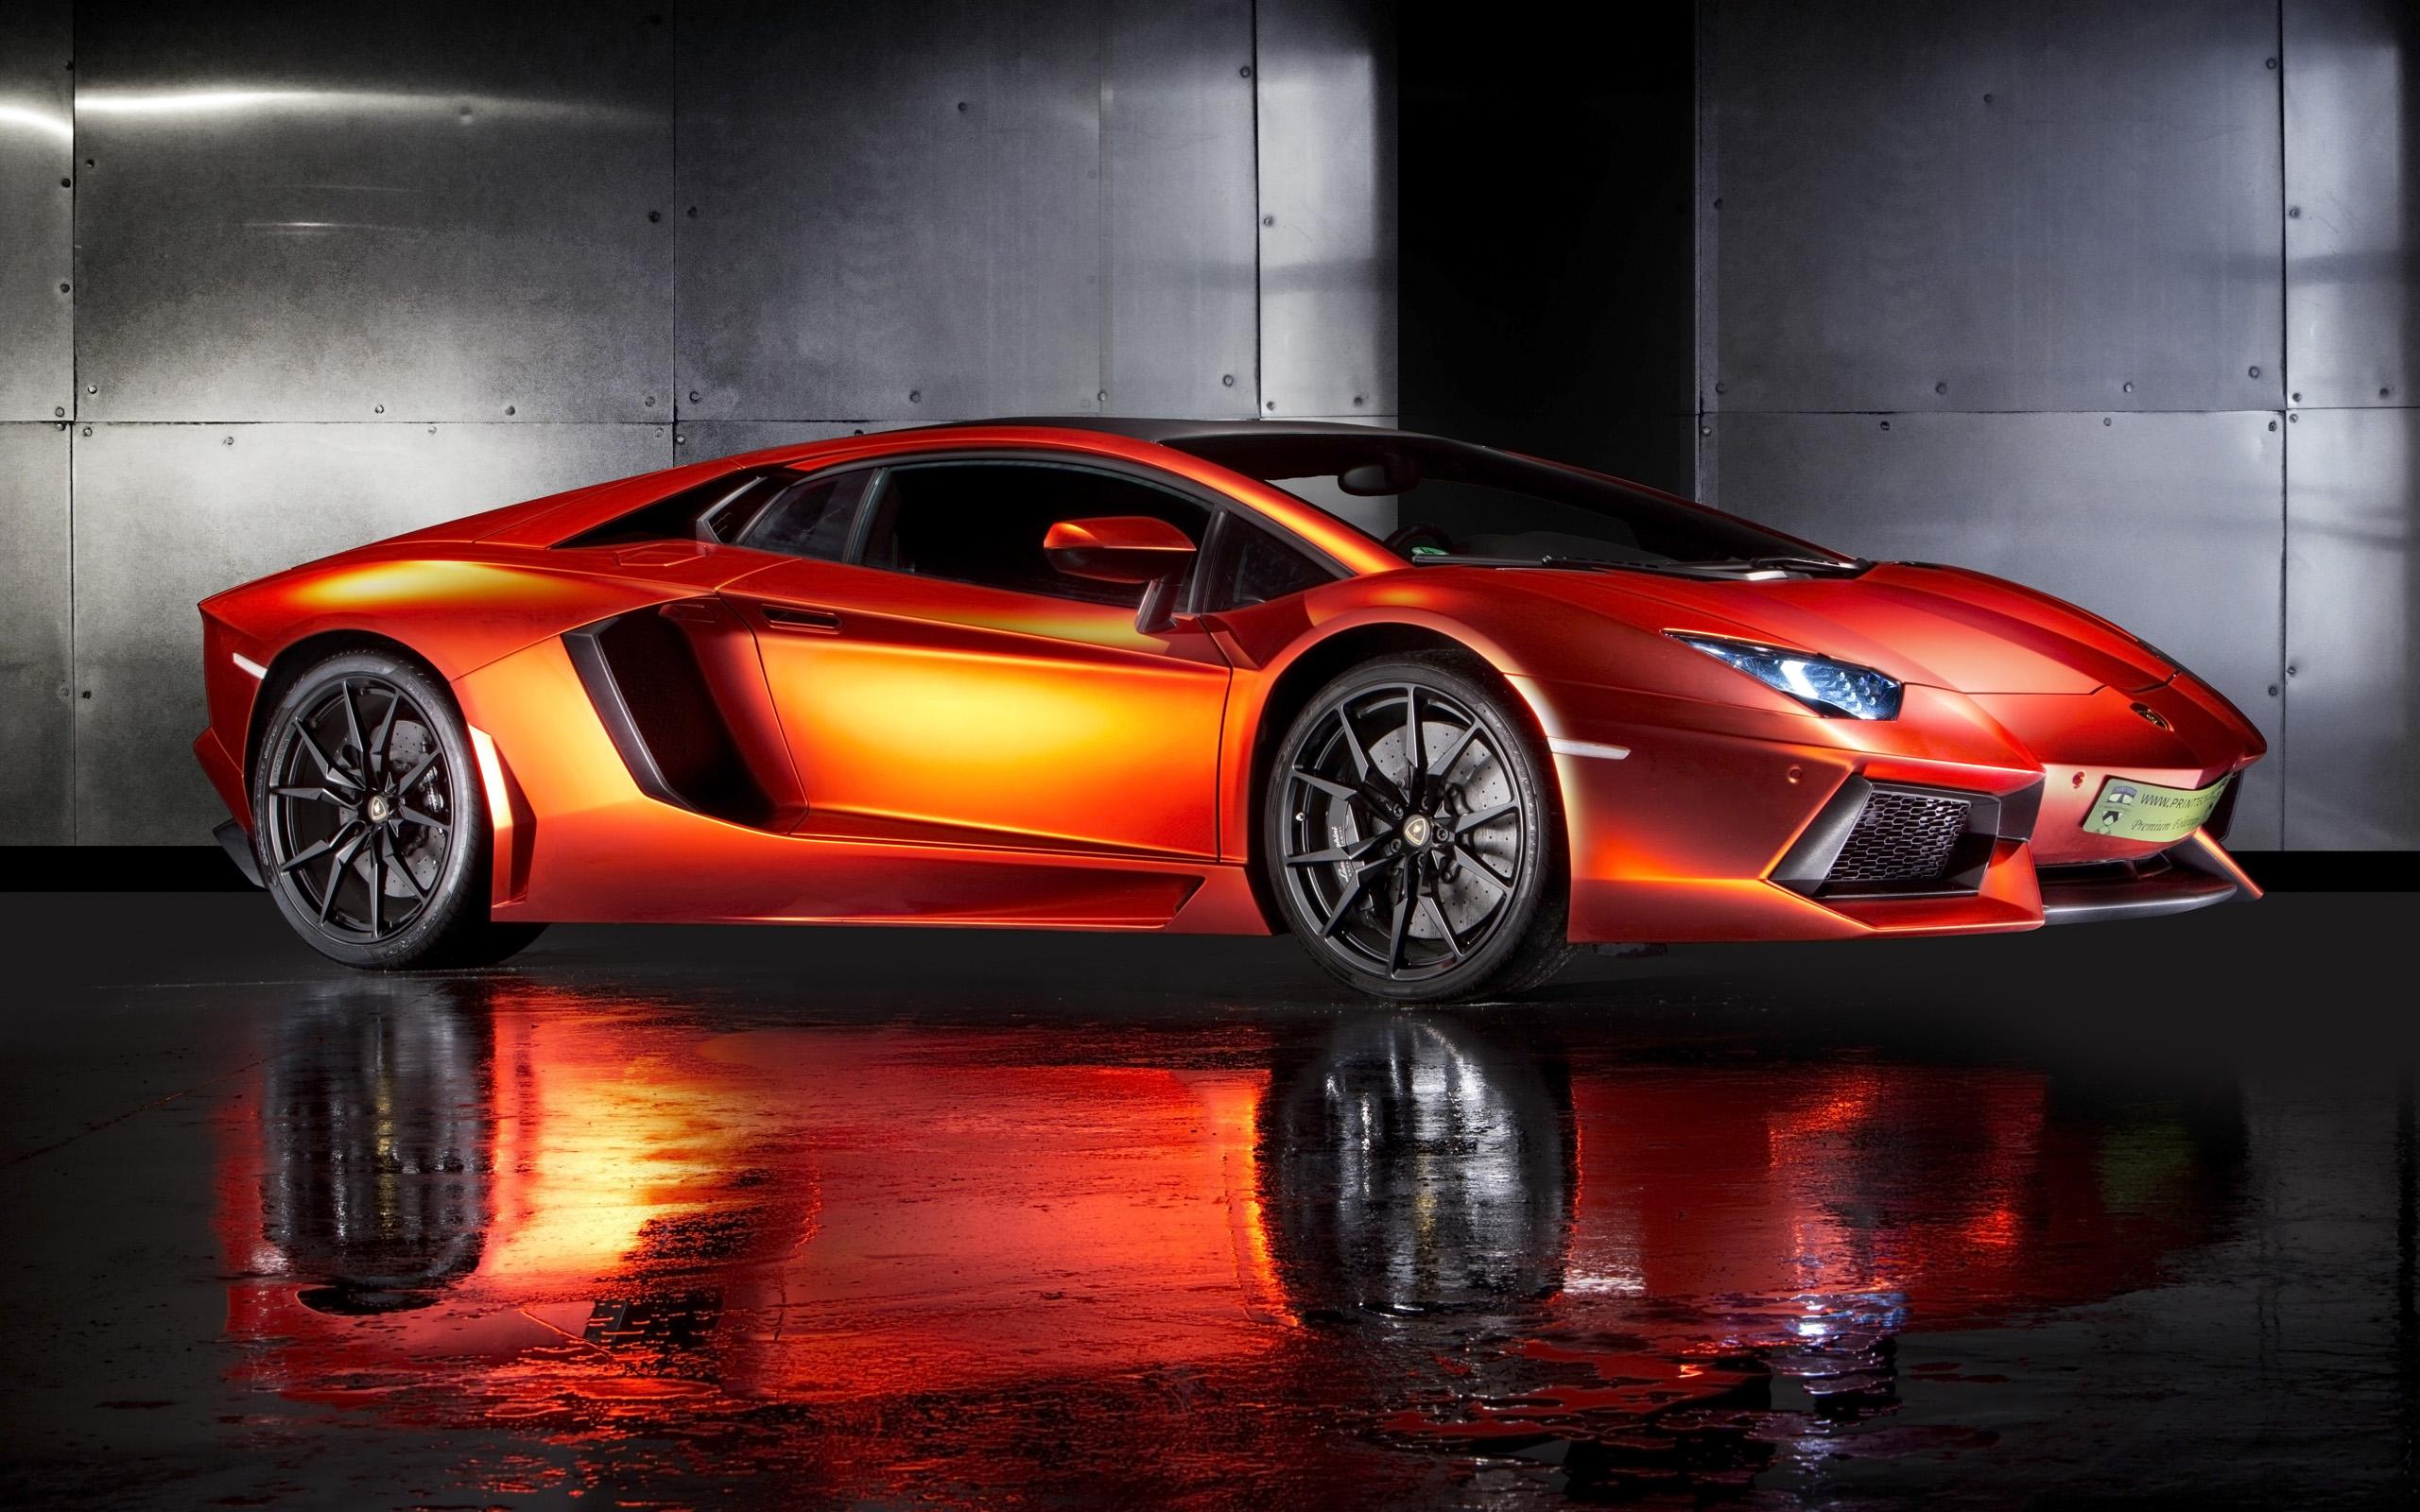 Lamborghini Aventador Supercar Hd Wallpaper